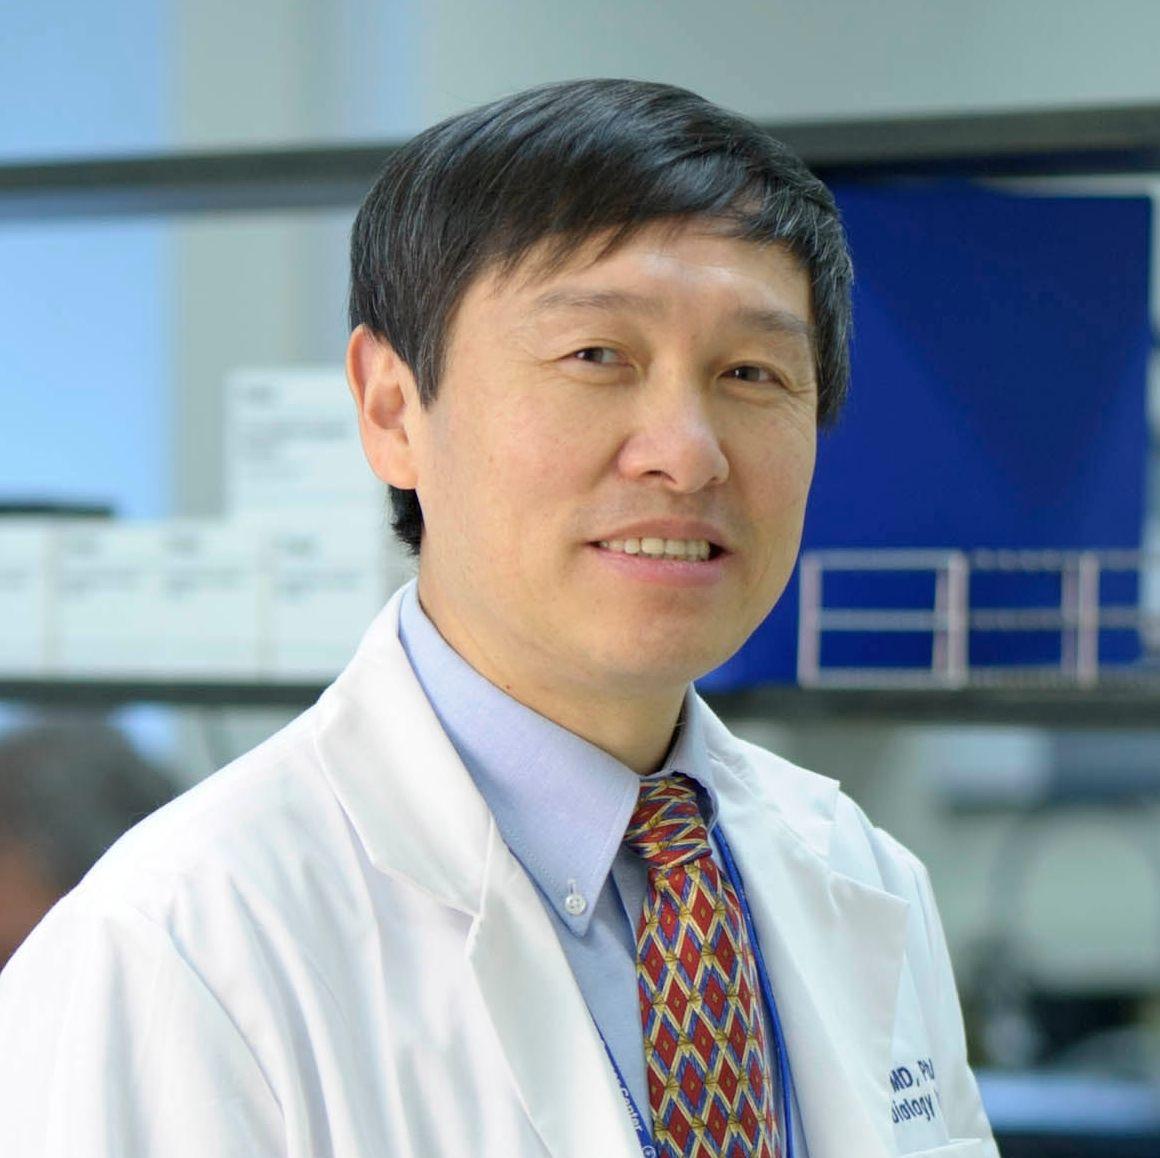 C Difficile Potentially Dangerous For Colorectal Cancer Patients Hcplive